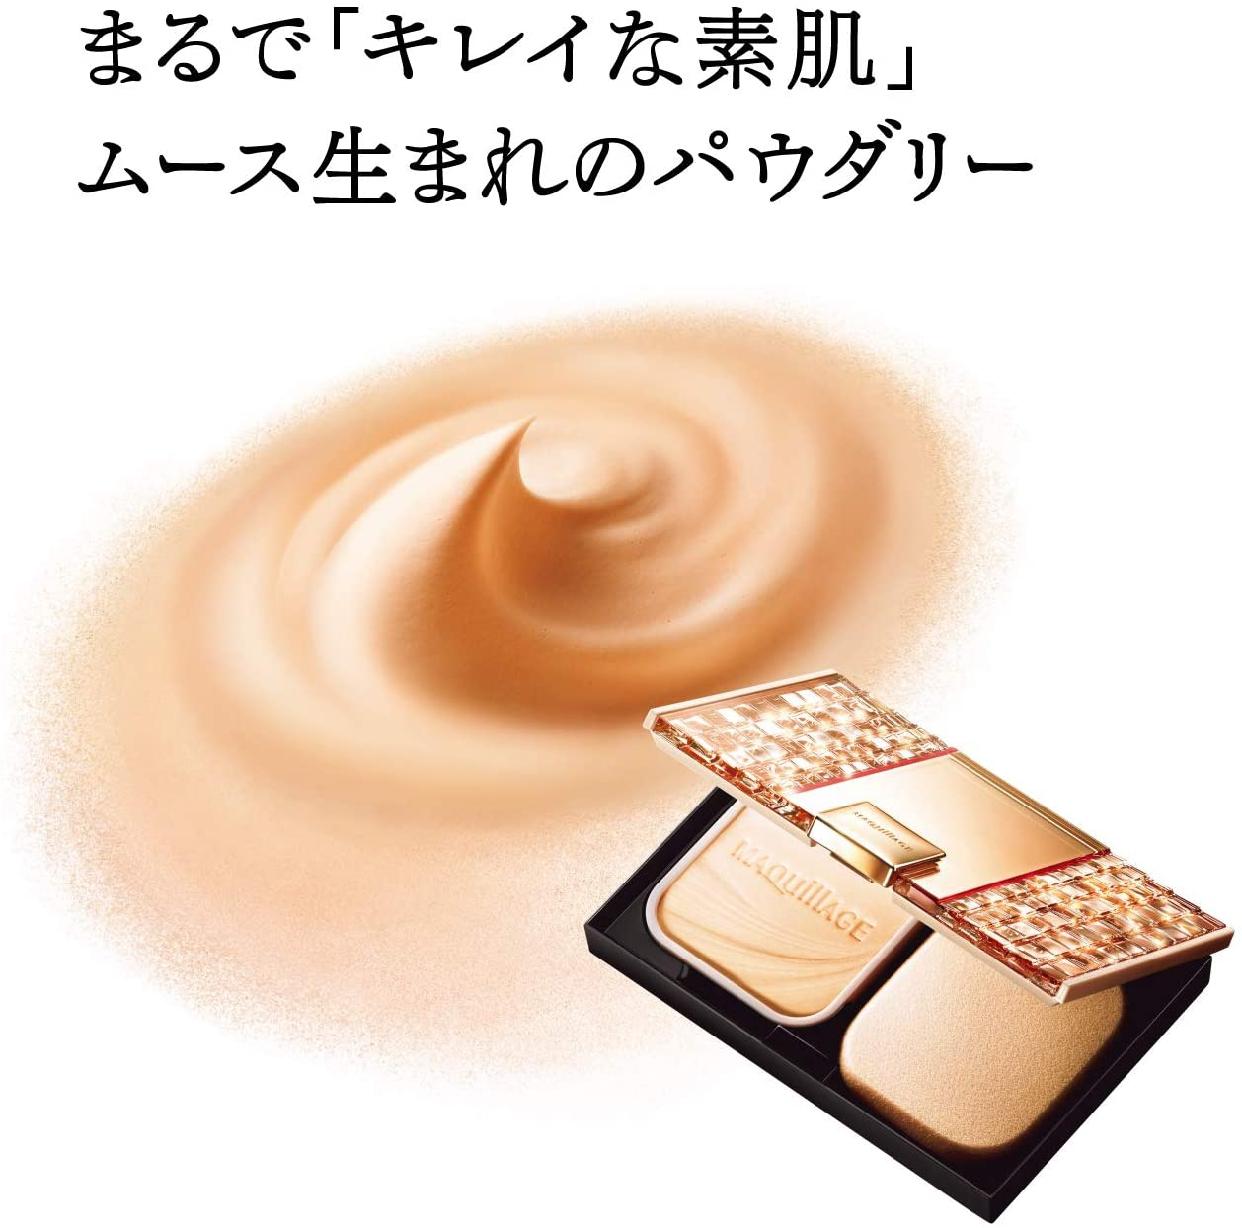 MAQuillAGE(マキアージュ) ドラマティックパウダリー UVの商品画像13